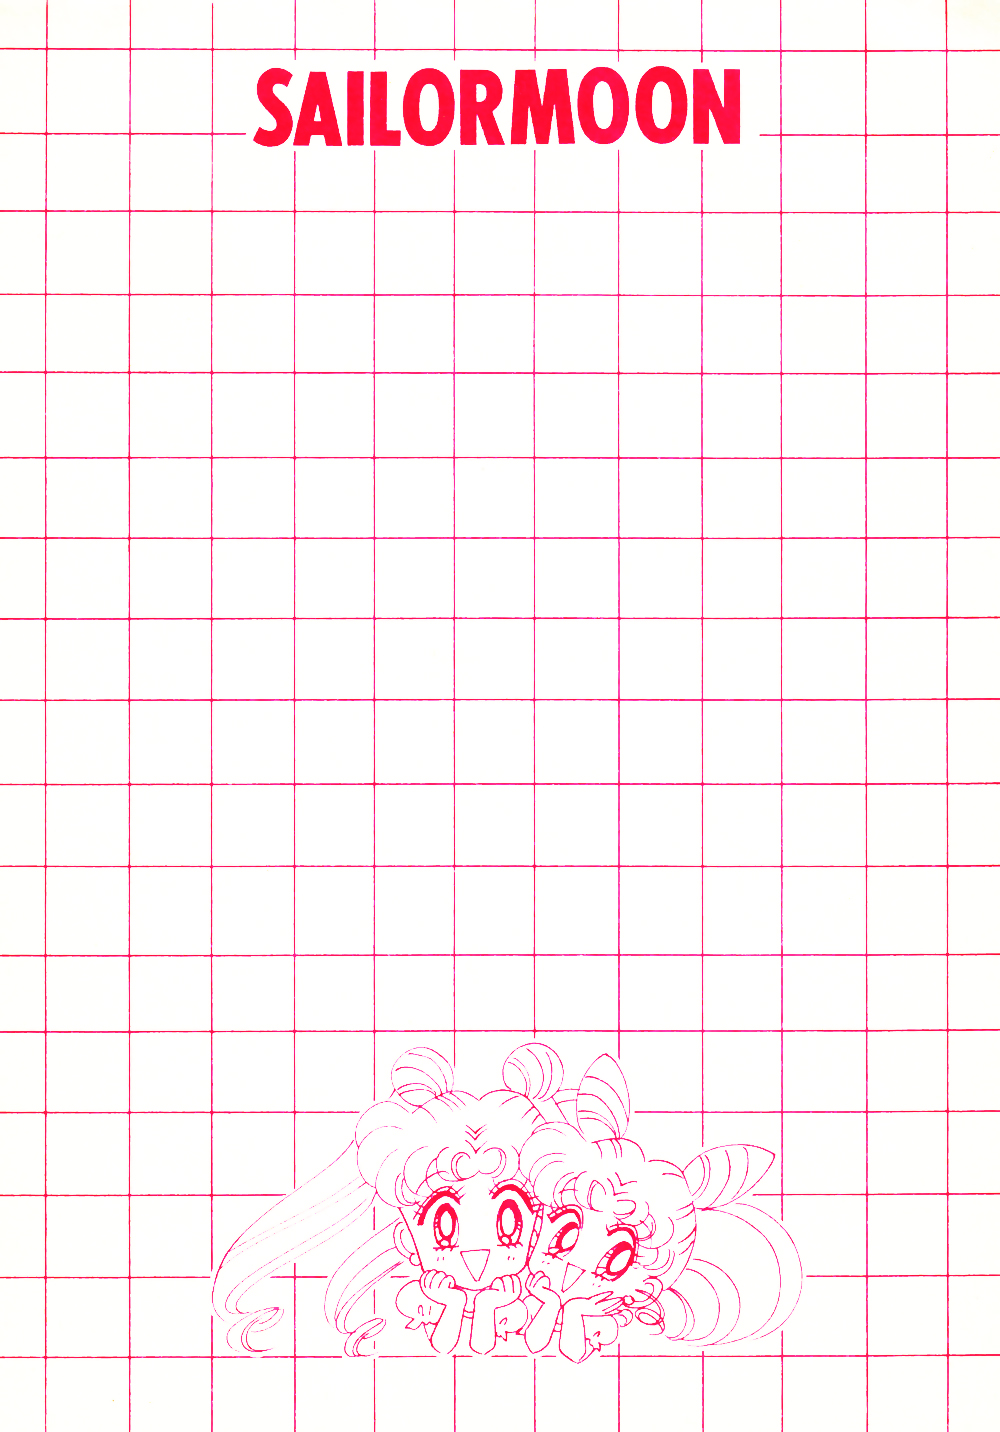 Sailor_moon_notepad_04